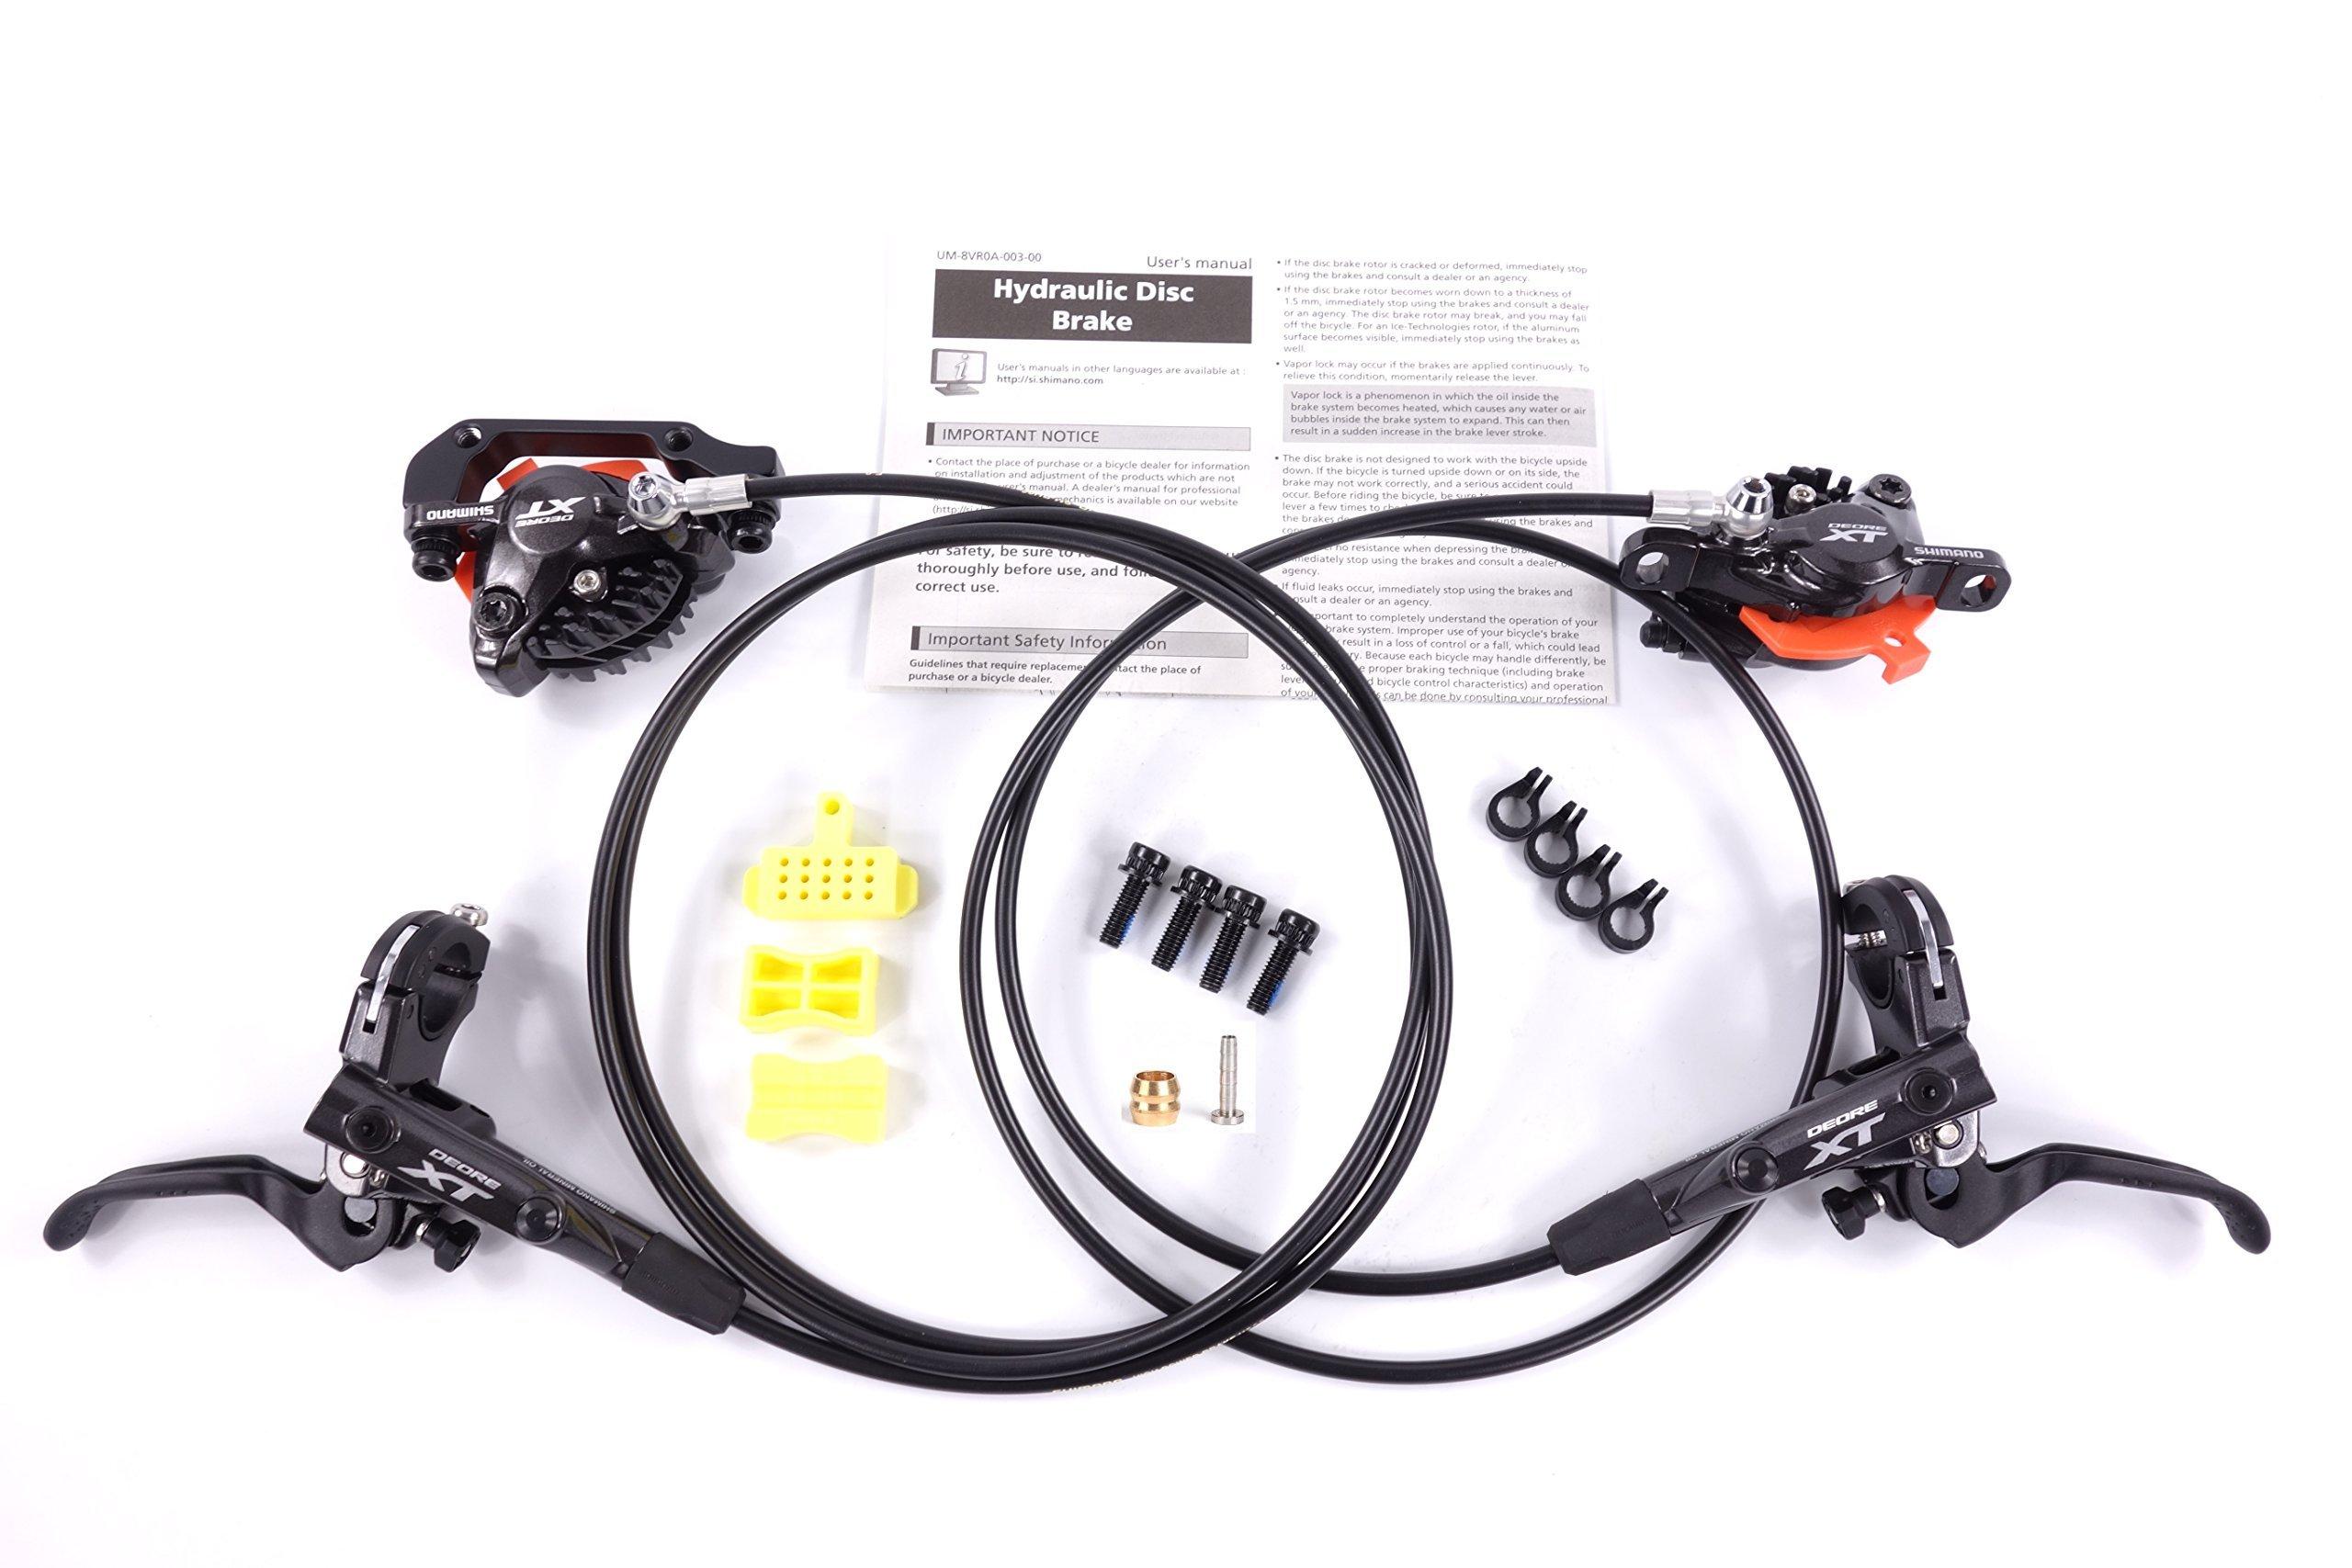 Shimano Deore XT M8000 Hydraulic Disk Brake MTB Front & Rear Set 1000mm/1600mm ice tech